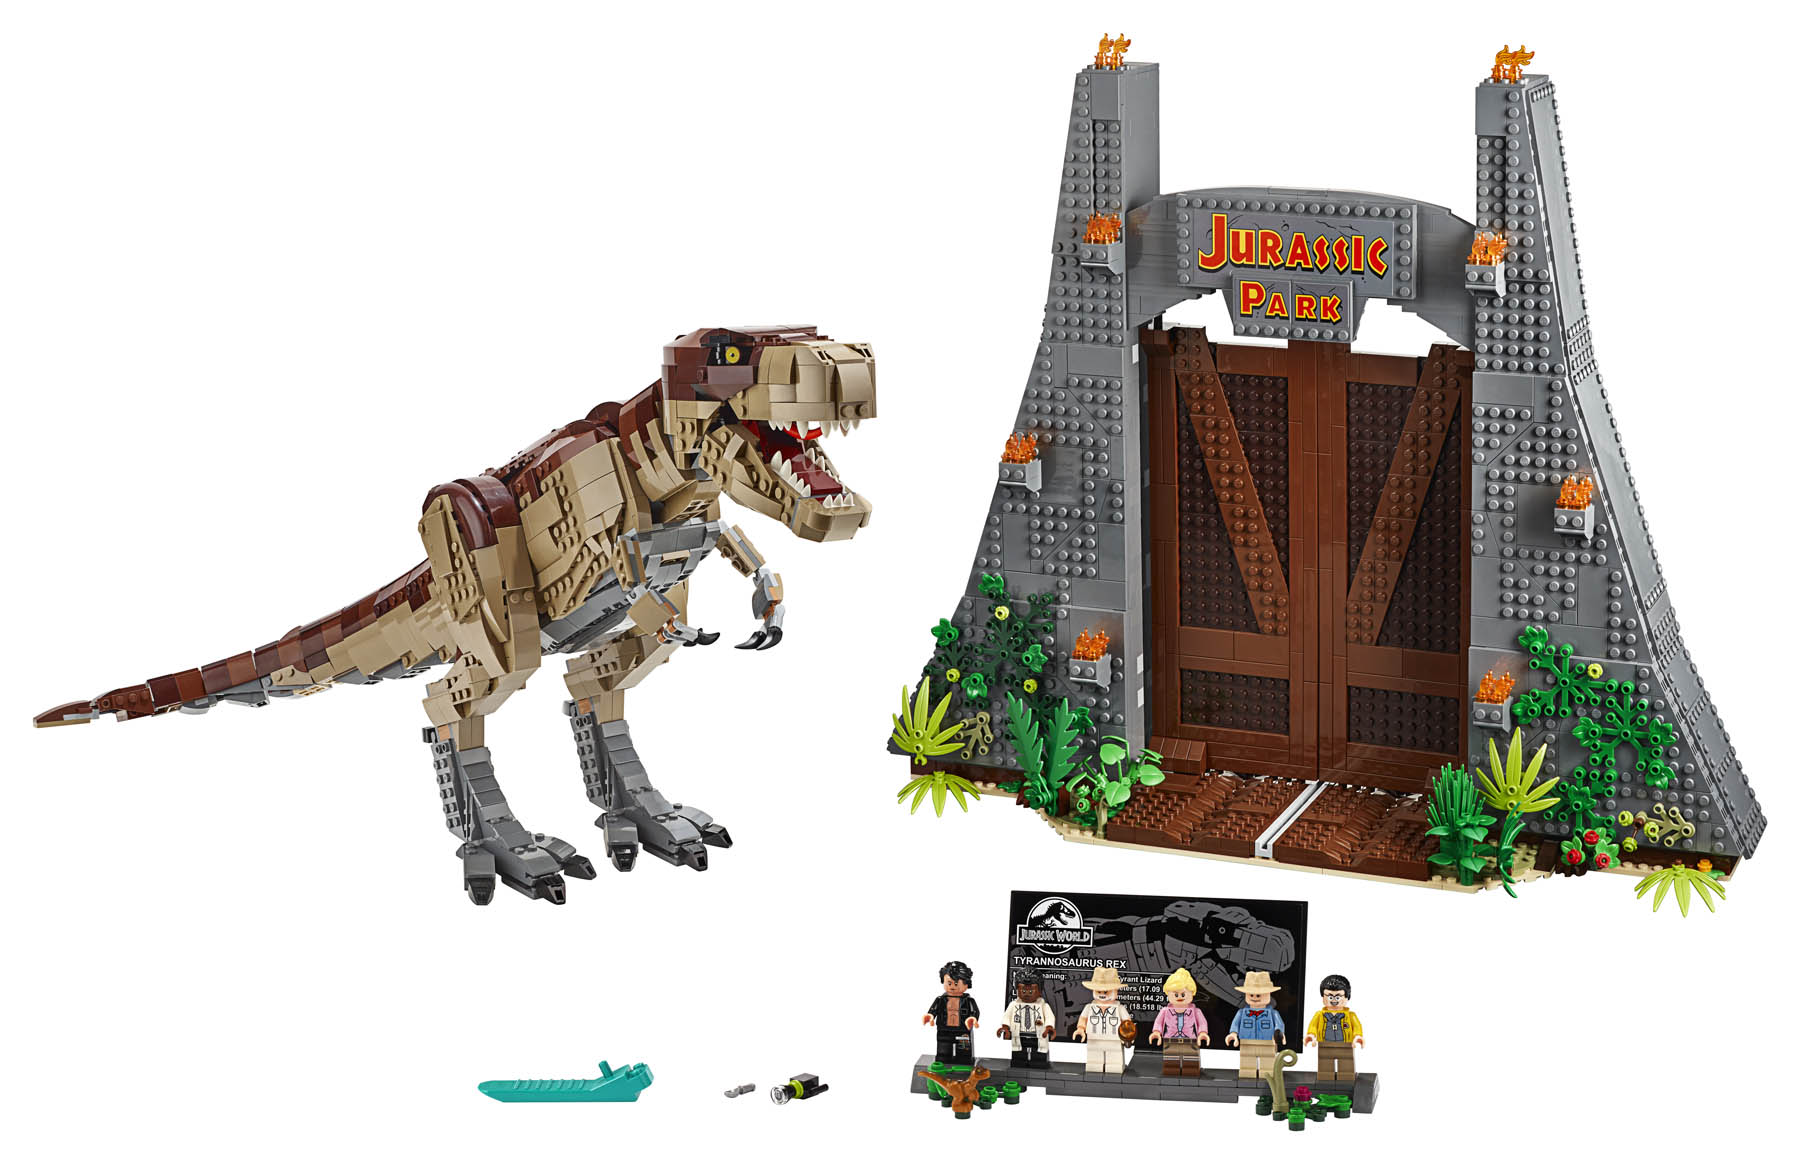 LEGO Announces UCS Jurassic Park Set - FBTB